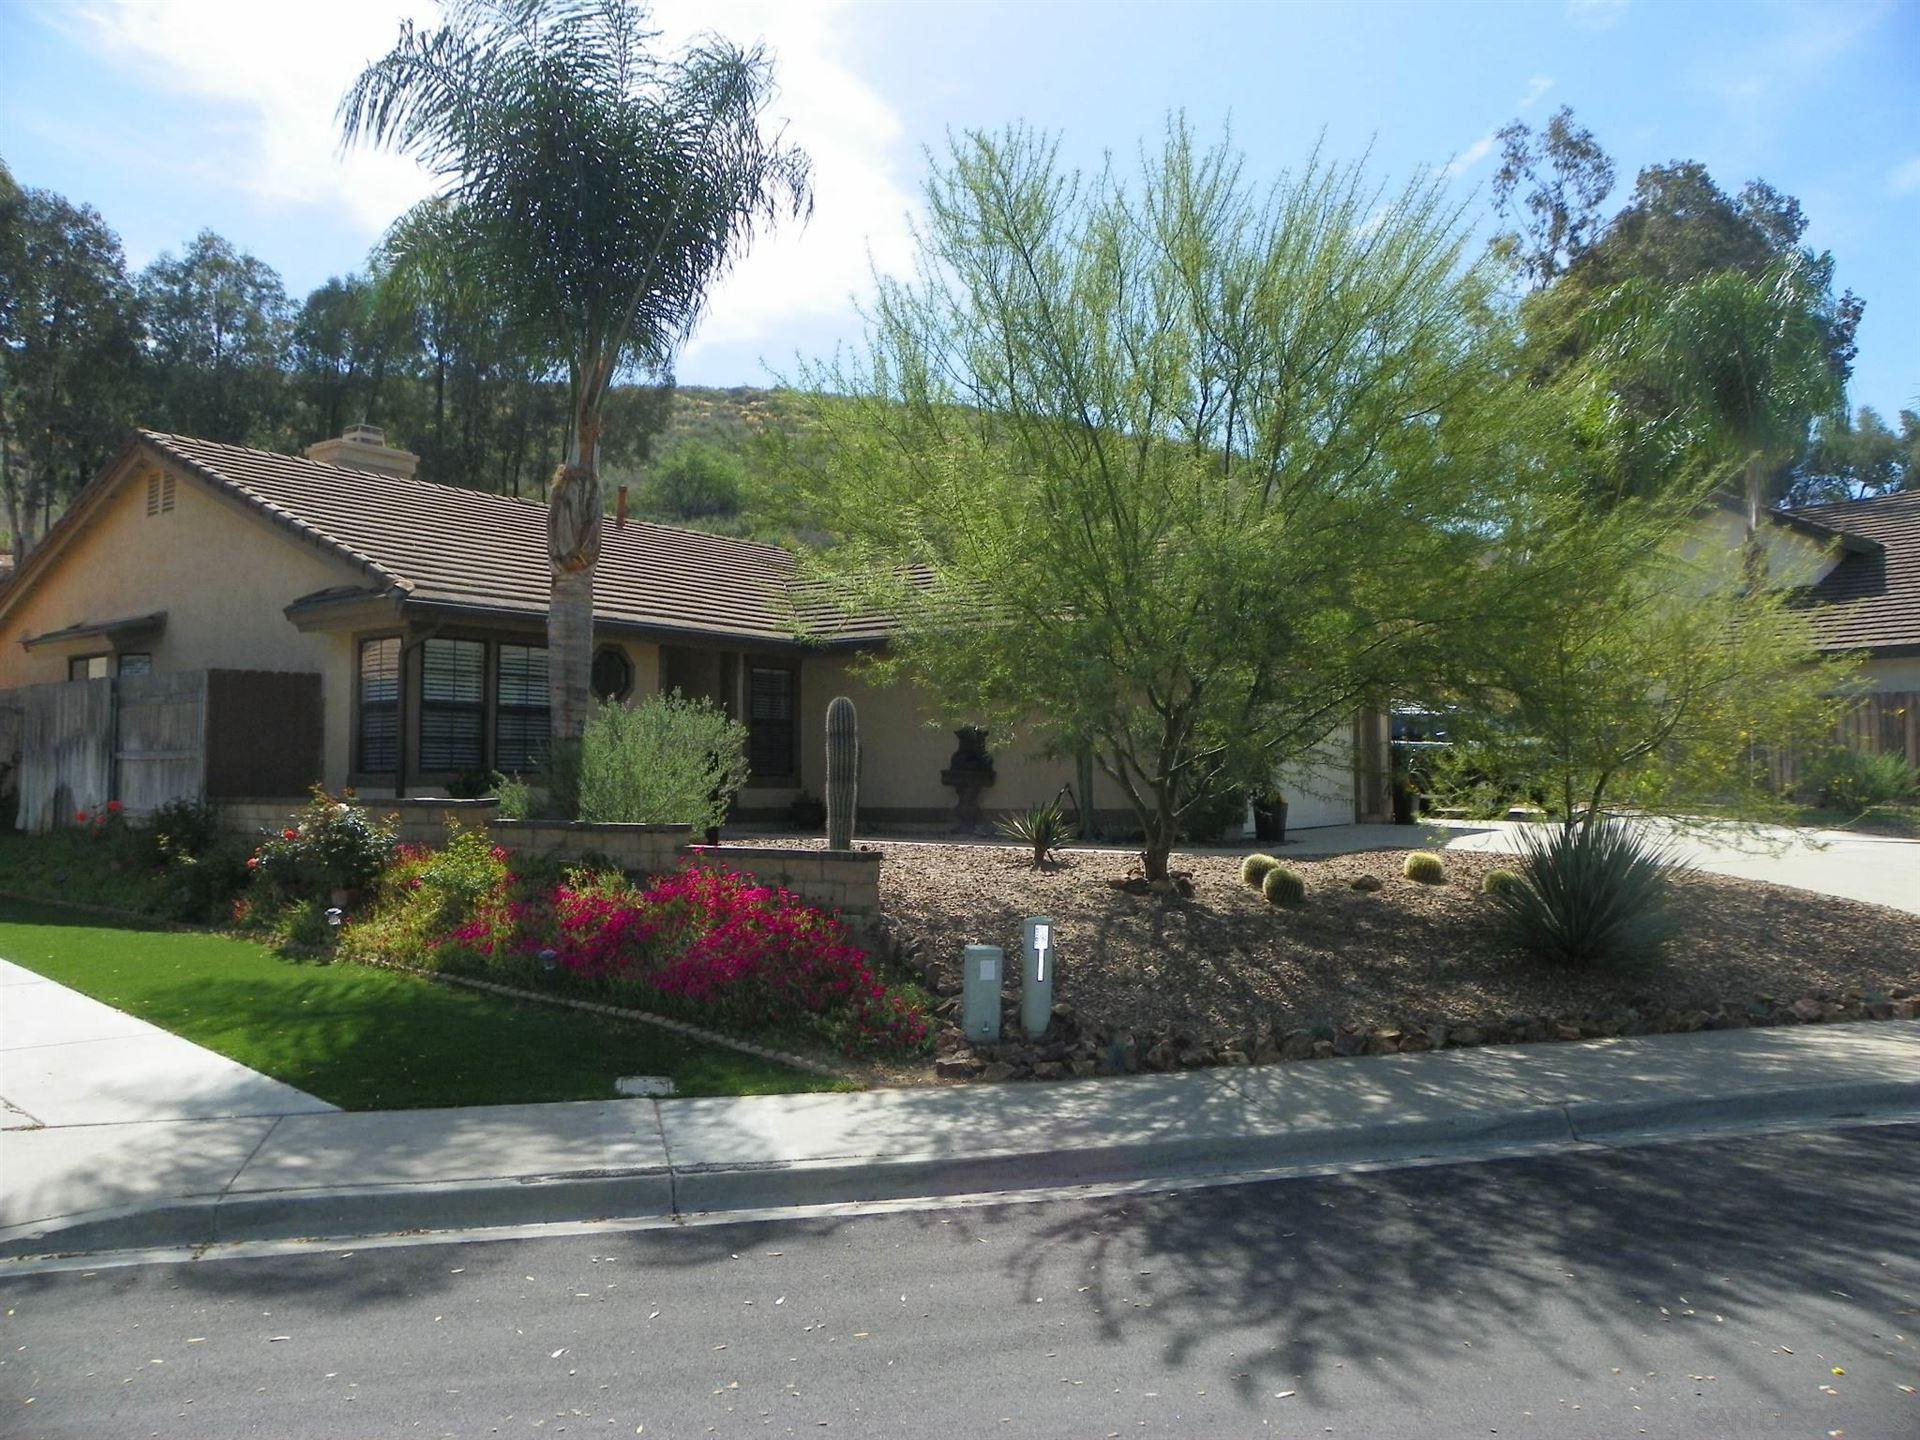 Photo of 9203 SINSONTE LN, LAKESIDE, CA 92040 (MLS # 210009348)